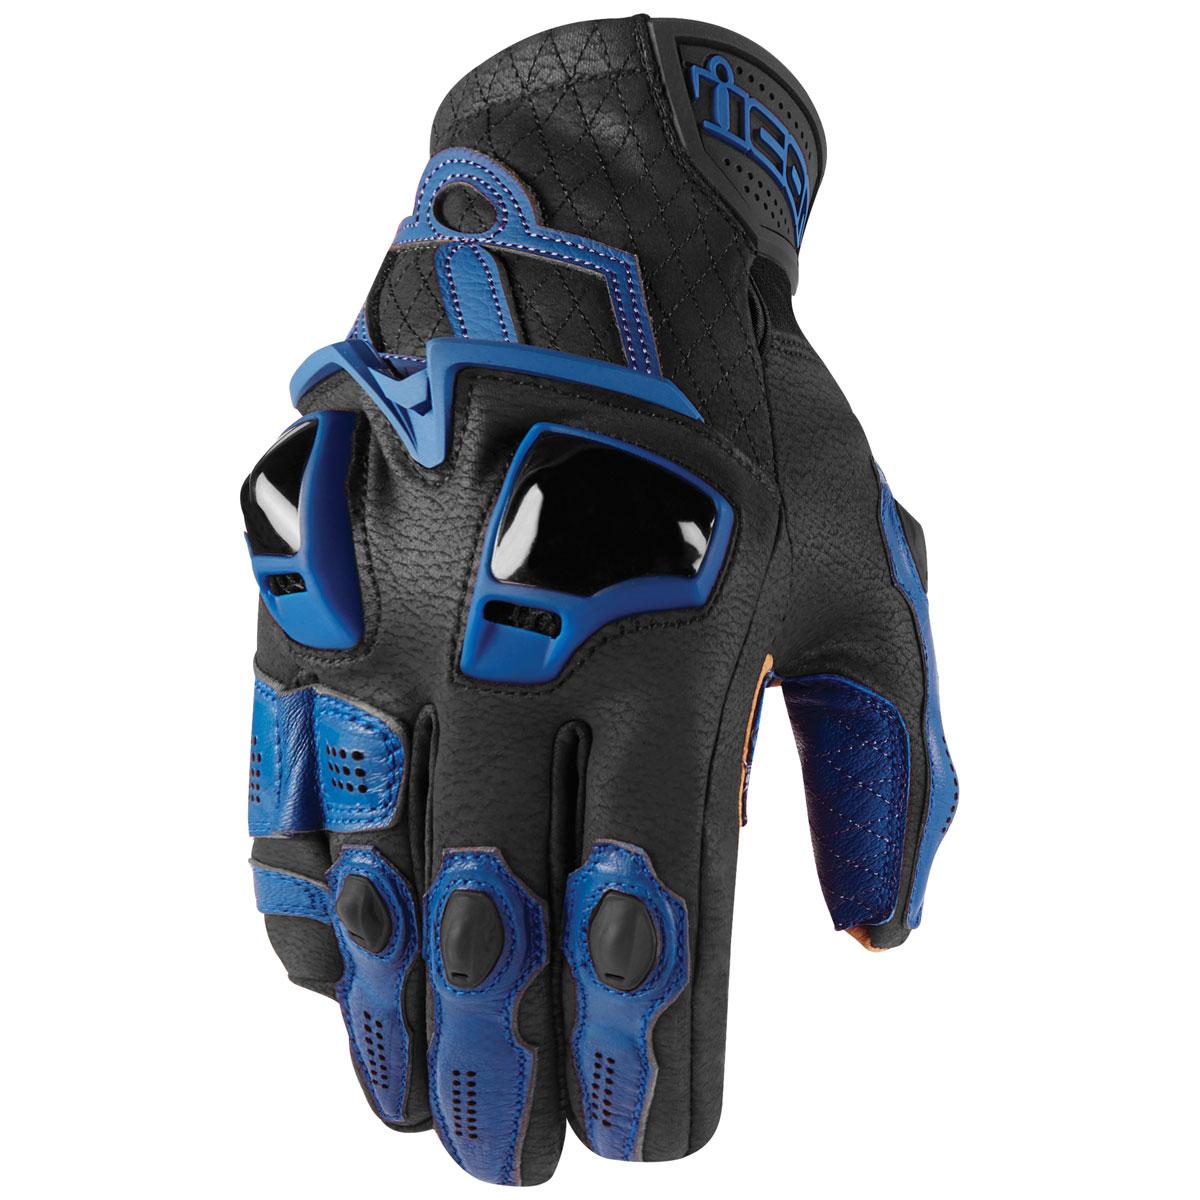 ICON Men's Hypersport Short Blue Gloves